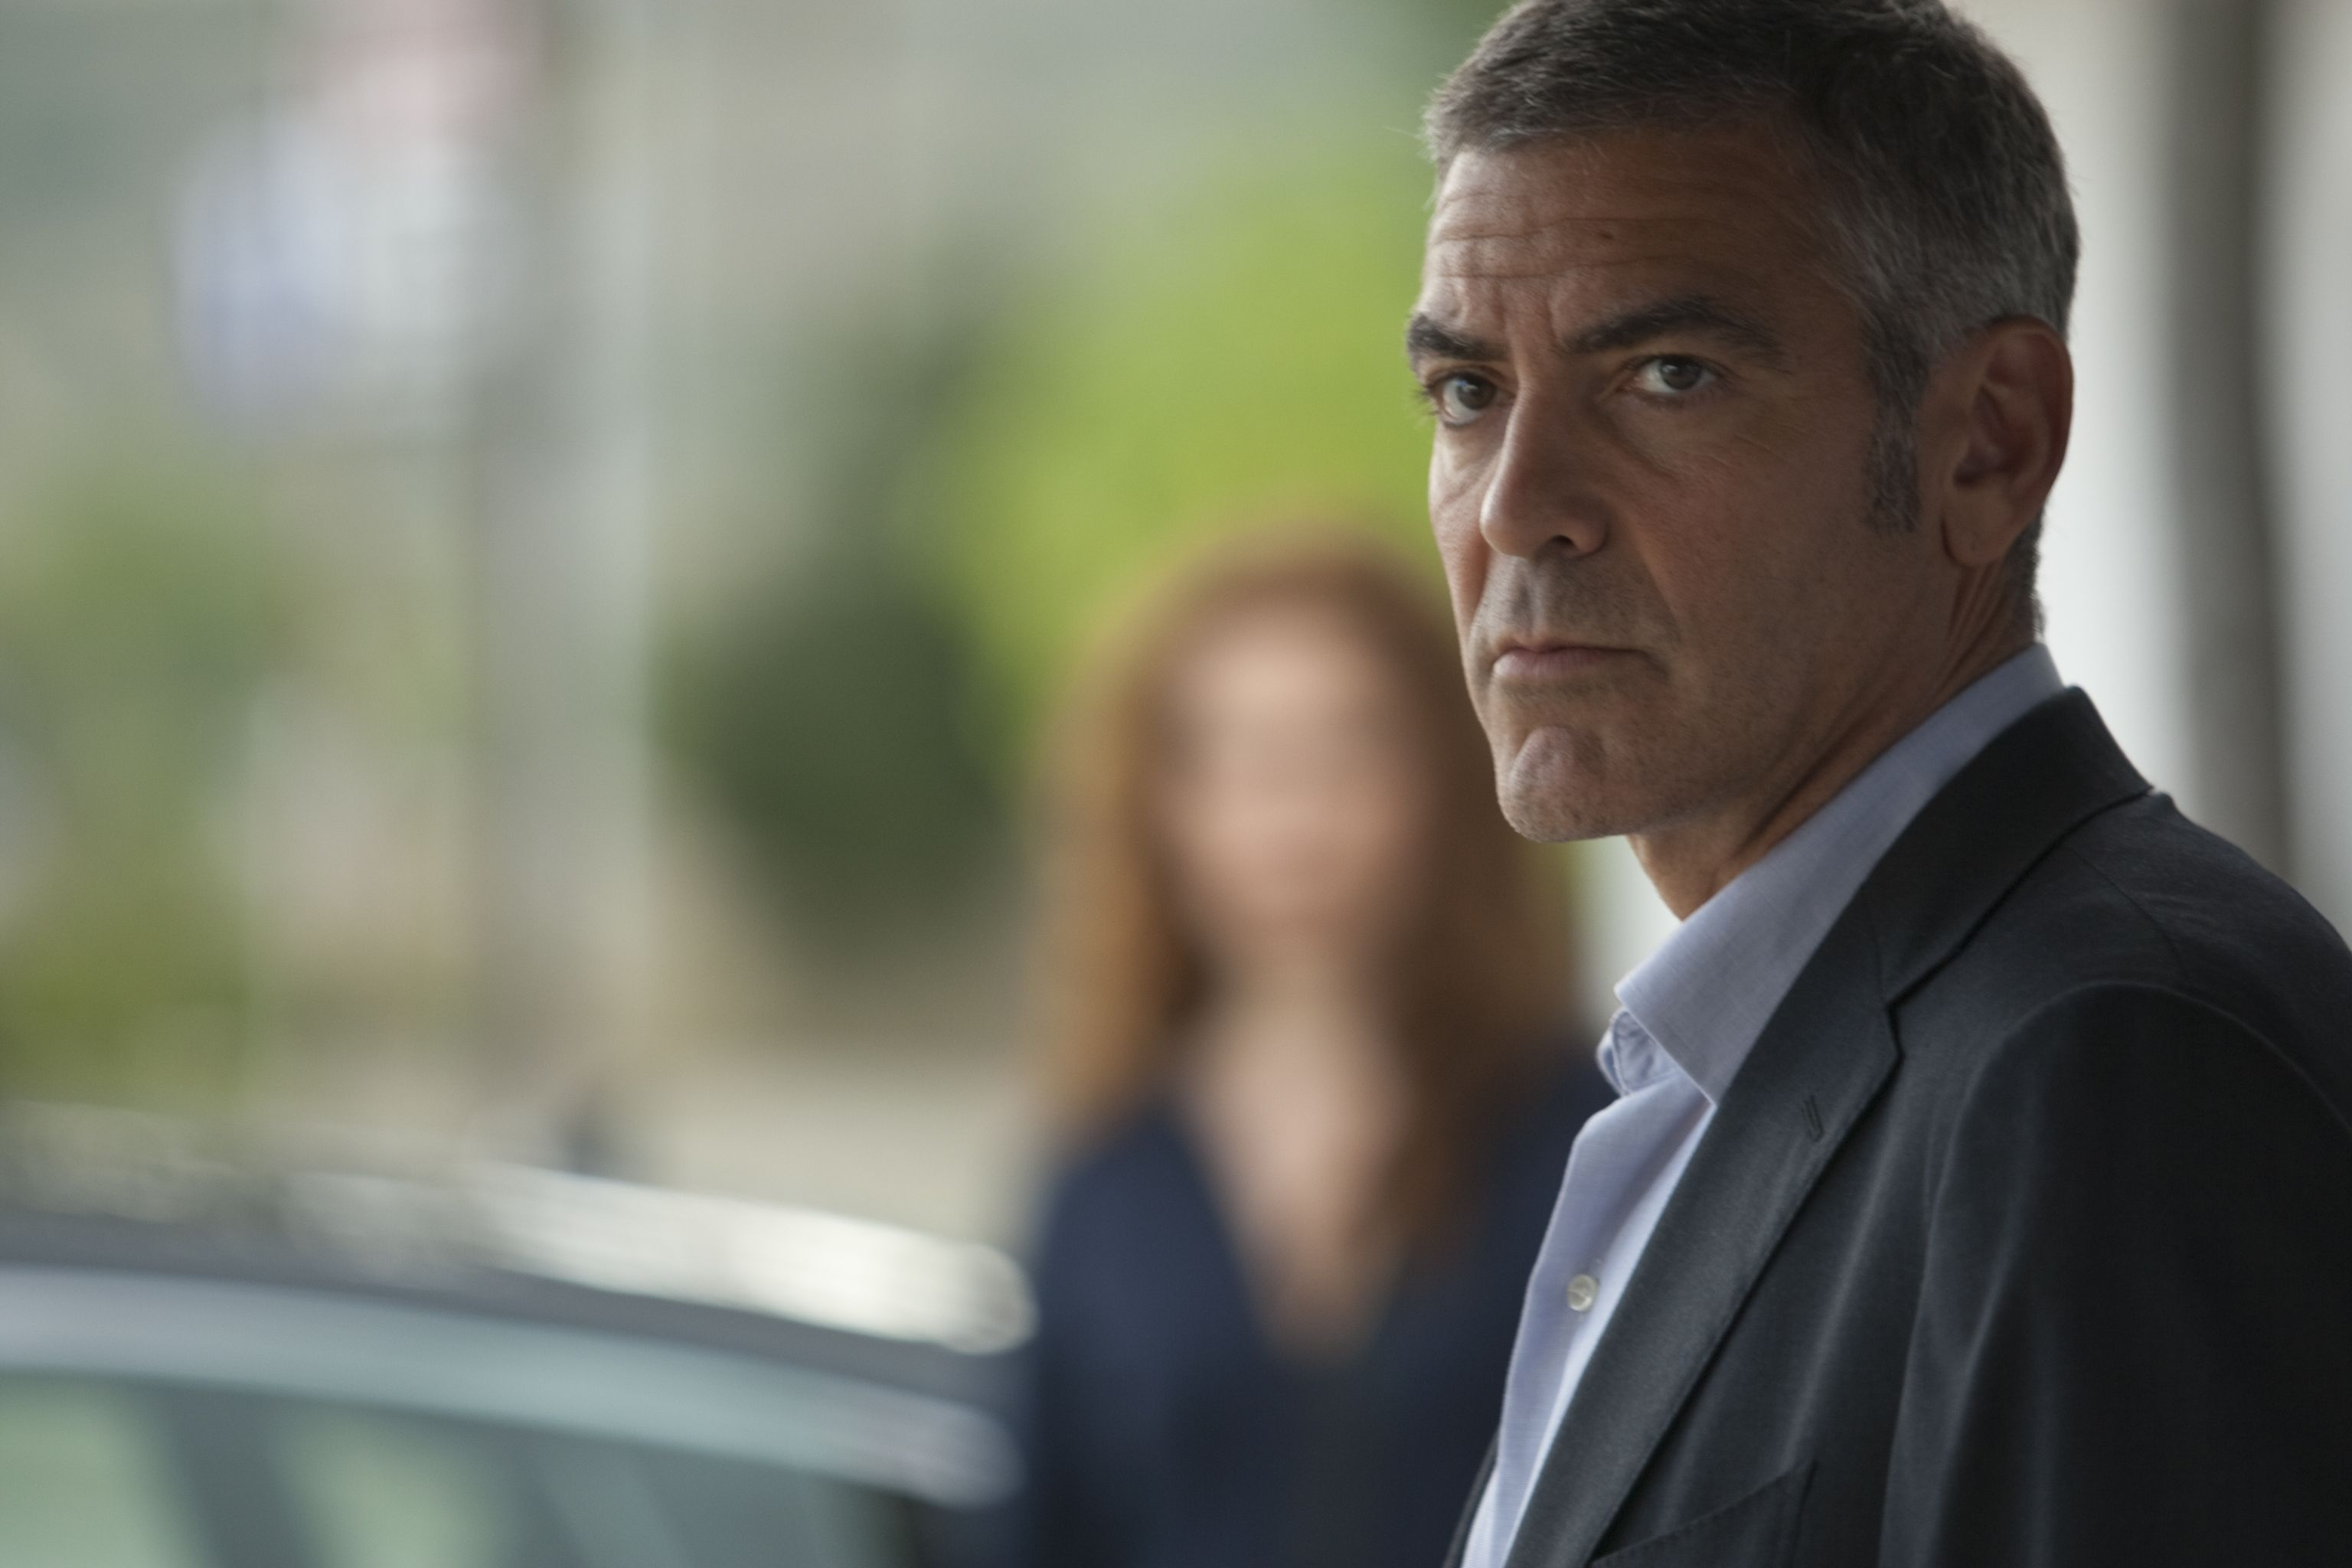 кадры из фильма Американец Виоланте Плачидо, Джордж Клуни,